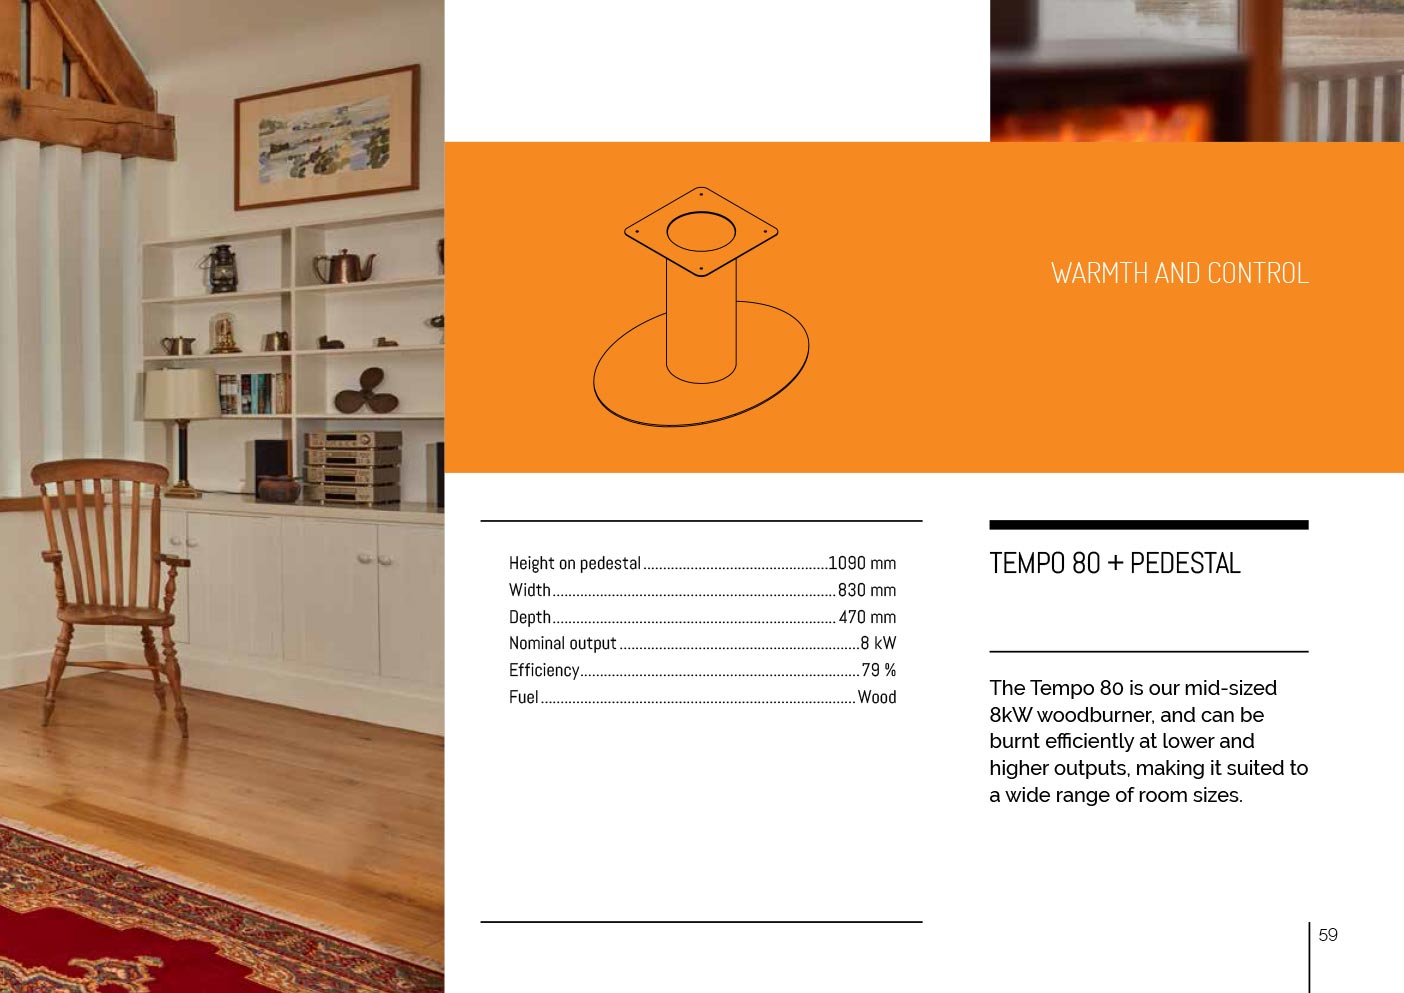 opus-stoves-brochure-(2)-59